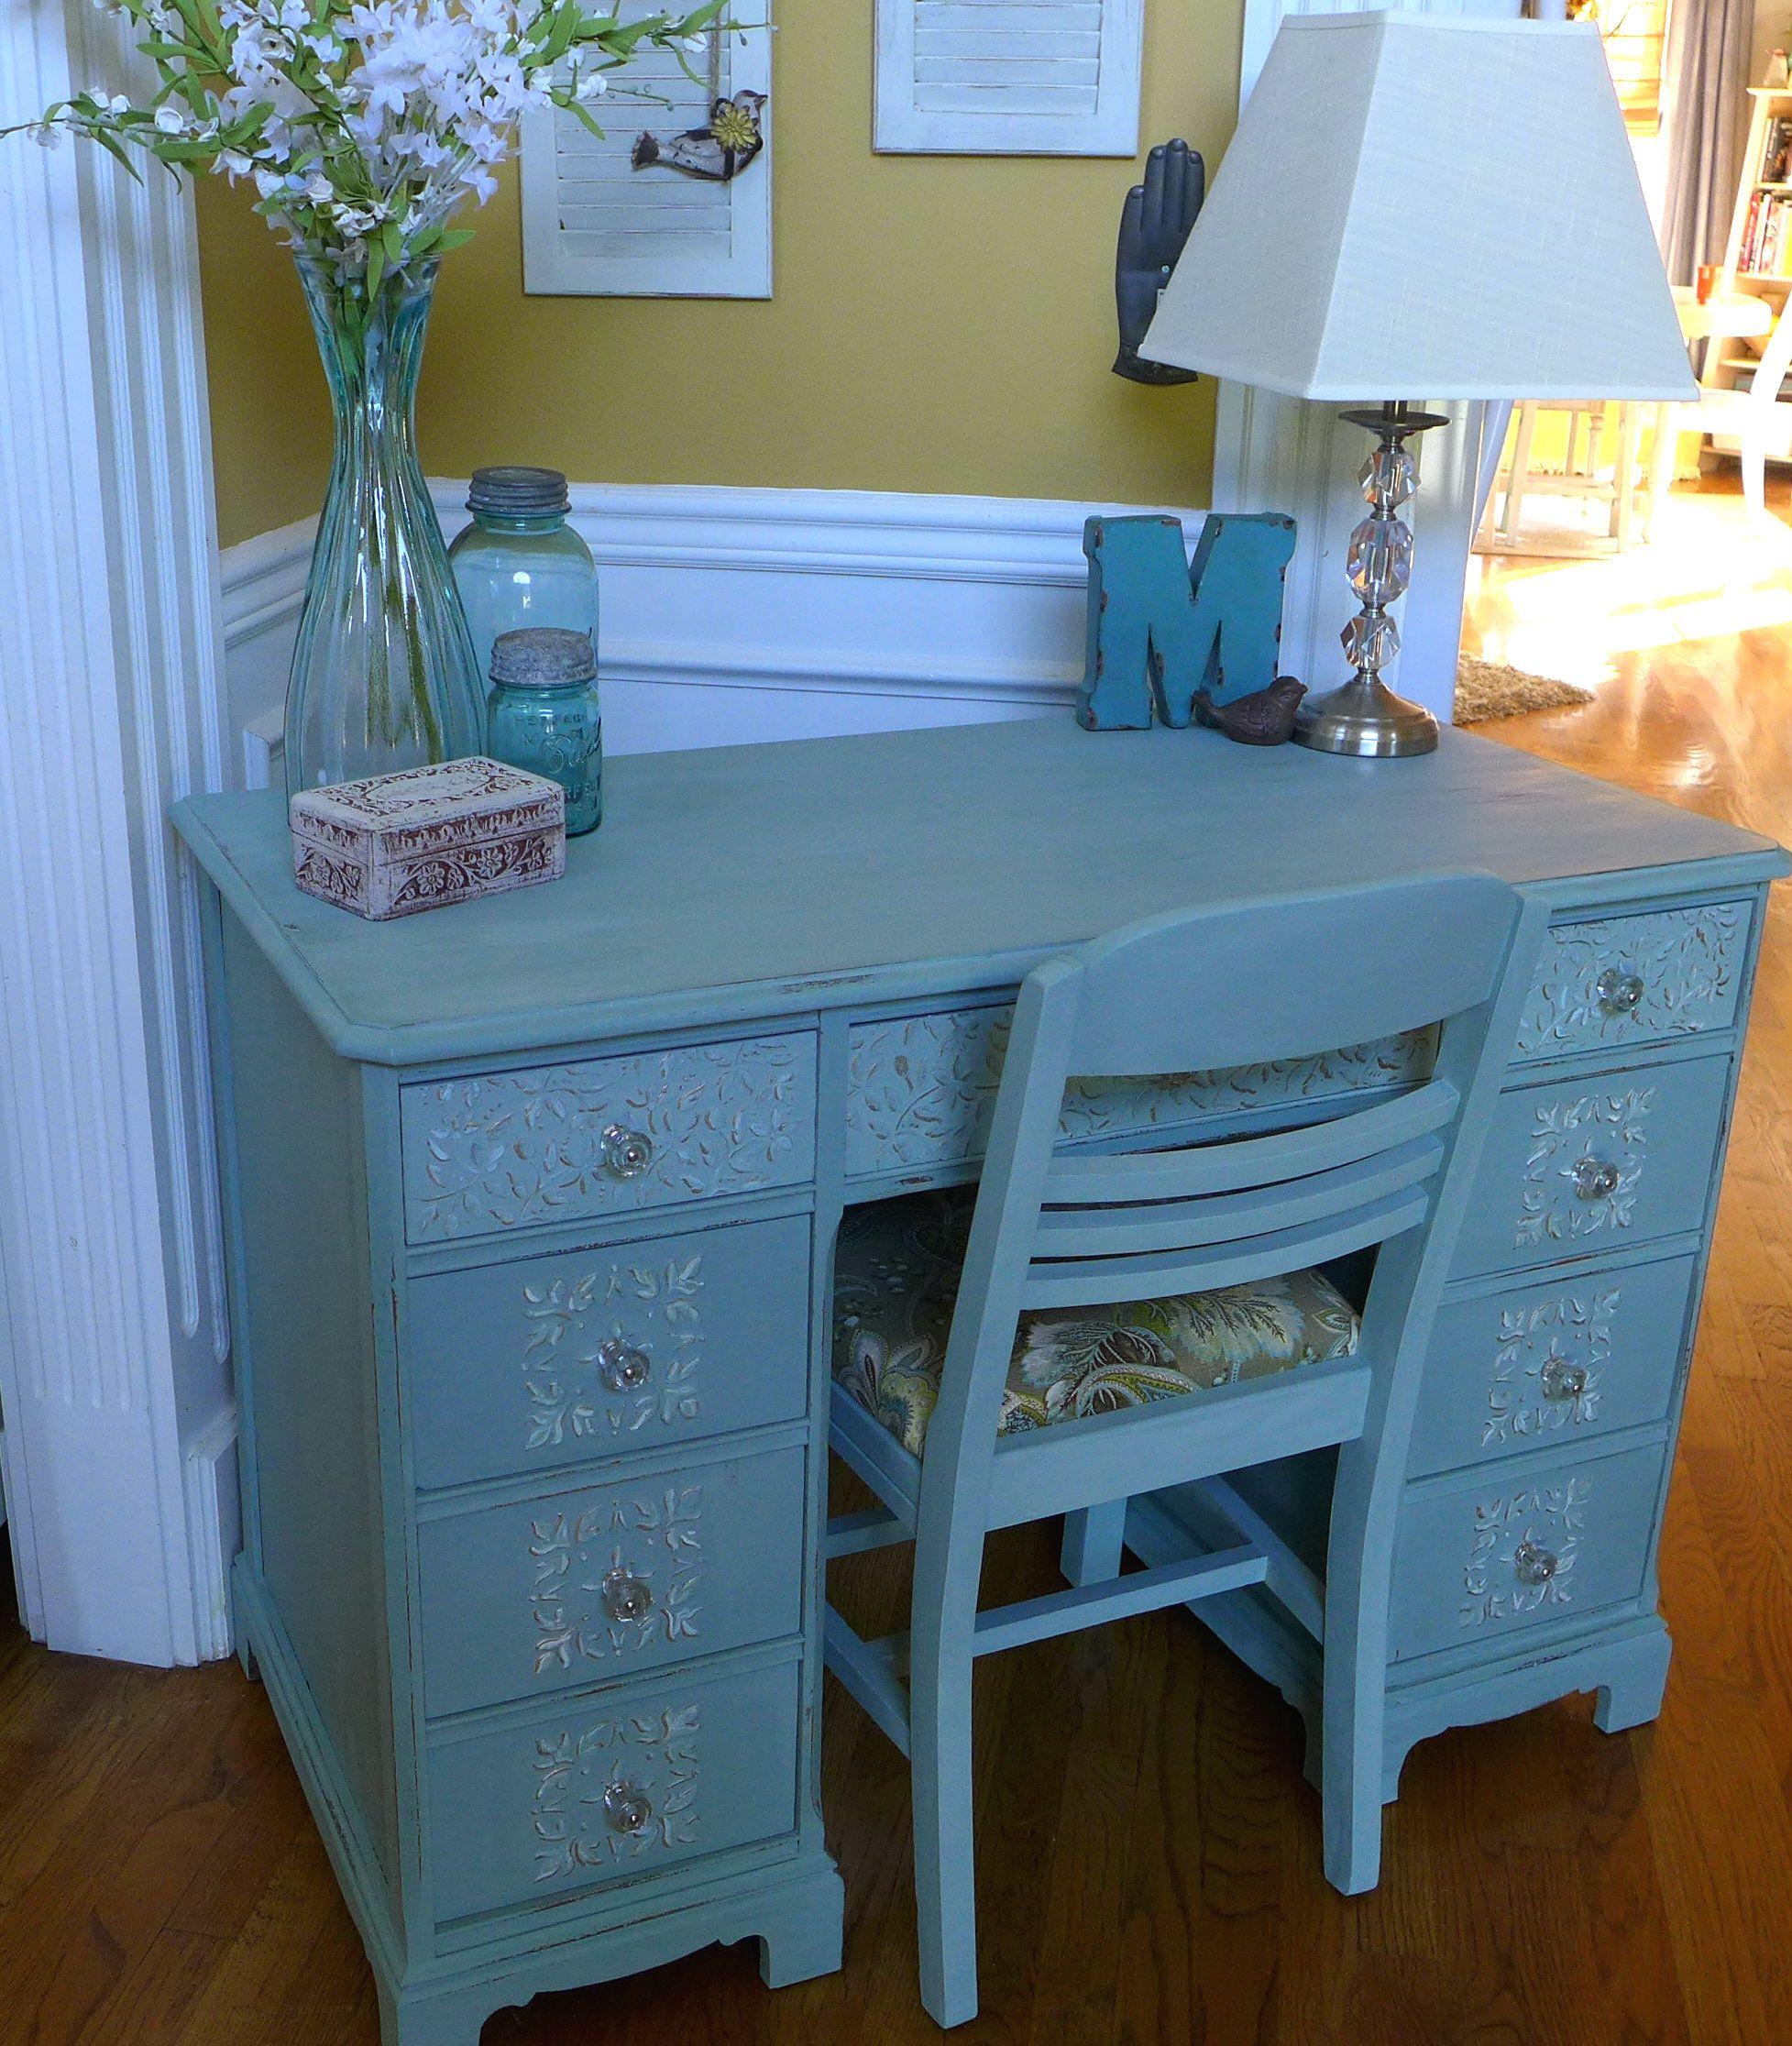 maison blanche la craie creme de menthe and robin 39 s egg blue chalk paint glacage was on the. Black Bedroom Furniture Sets. Home Design Ideas